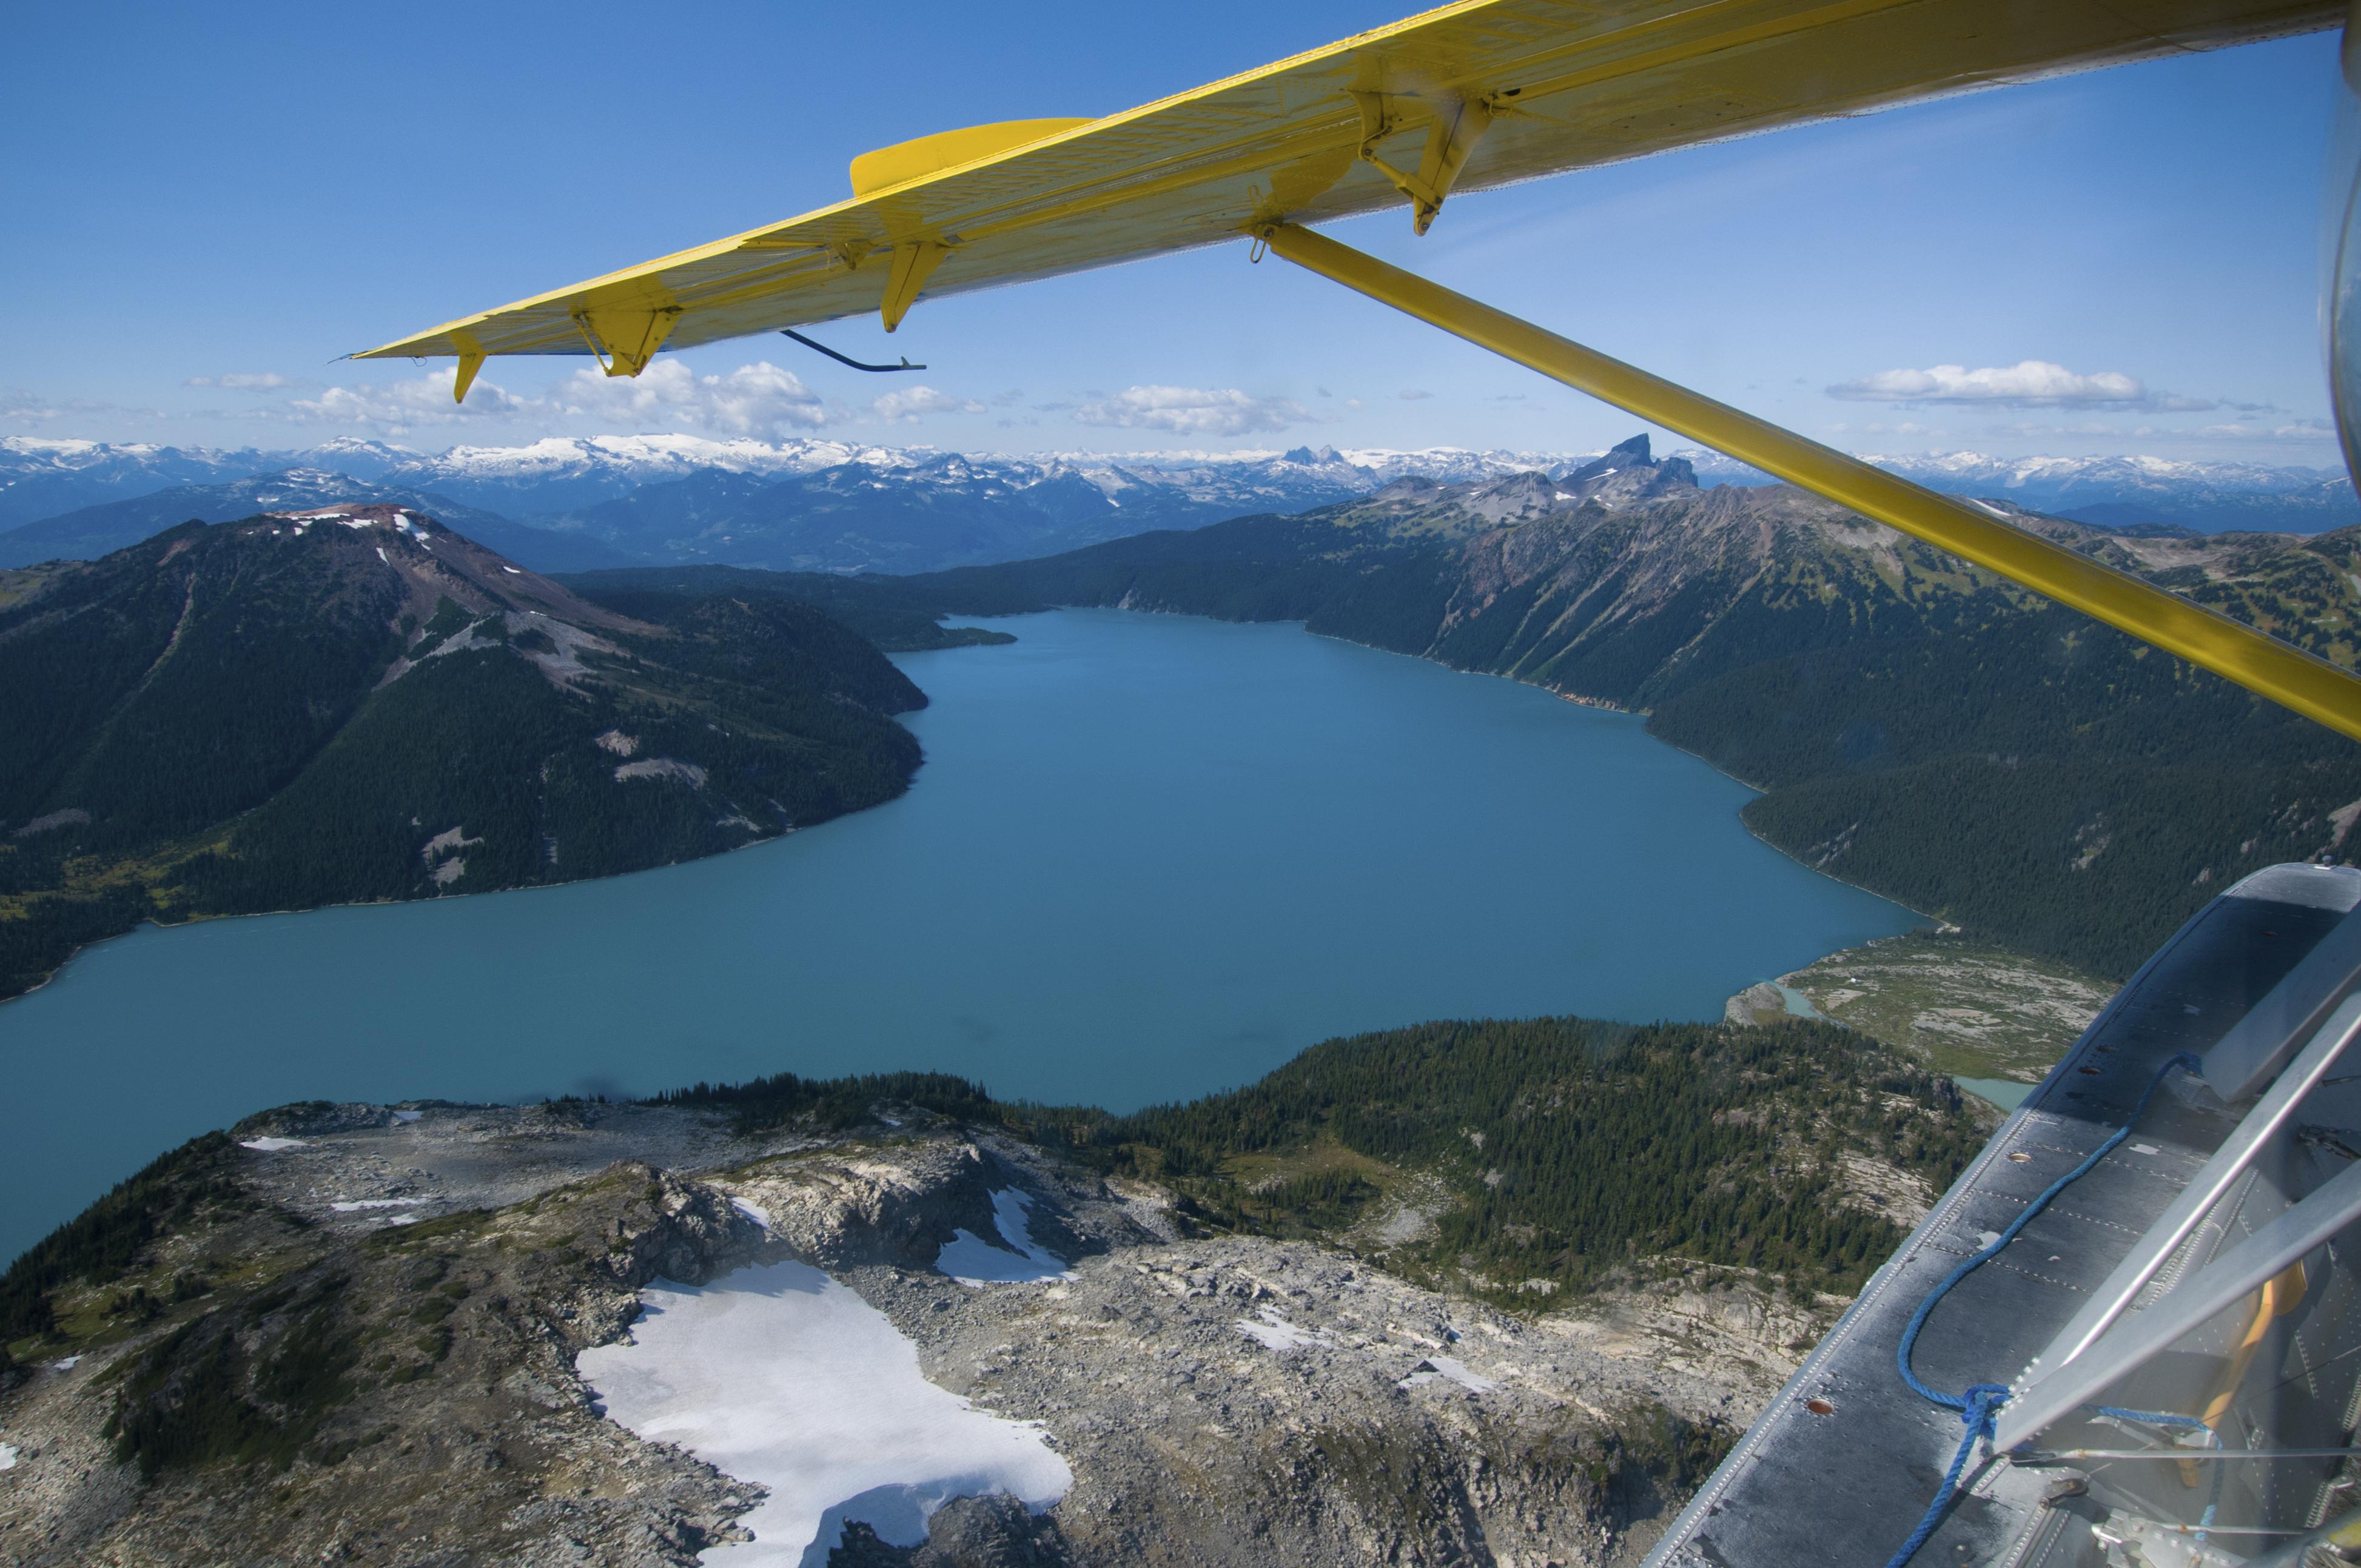 Air flight over Garibaldi Lake, Whistler, Canada's West, aerospace in Canada, aviation in Canada, Aerospace Industries Association of Canada, AIAC, AIAC Pacific